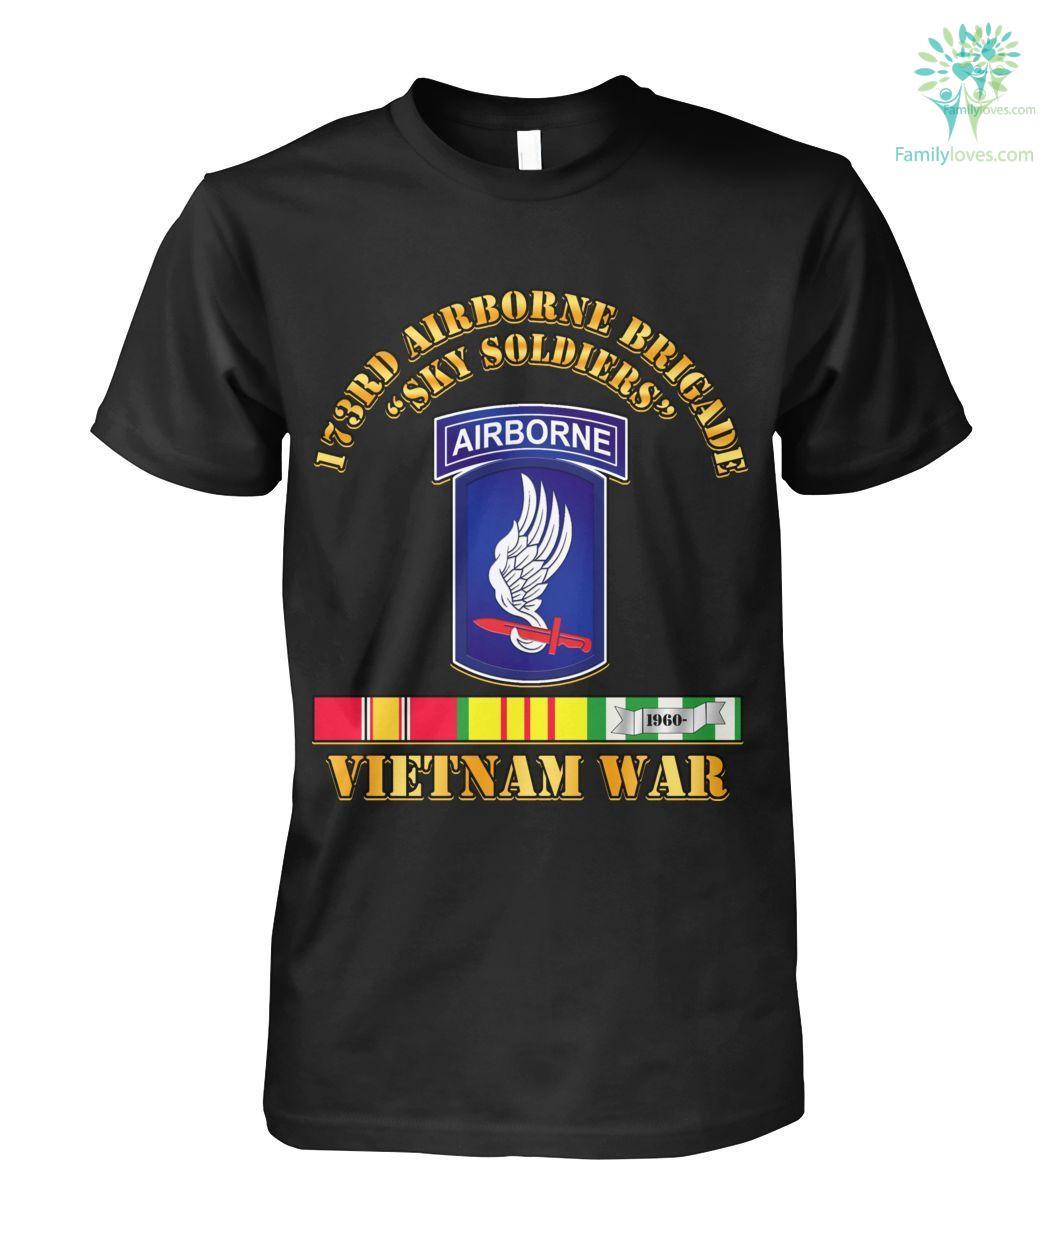 173rd-airborne-brigade_562ba7ee-33b6-029b-934f-7a668766aad7 173rd Airborne Brigade sky soldiers vietnam war hoodie, sweatshirt, t-shirt  %tag